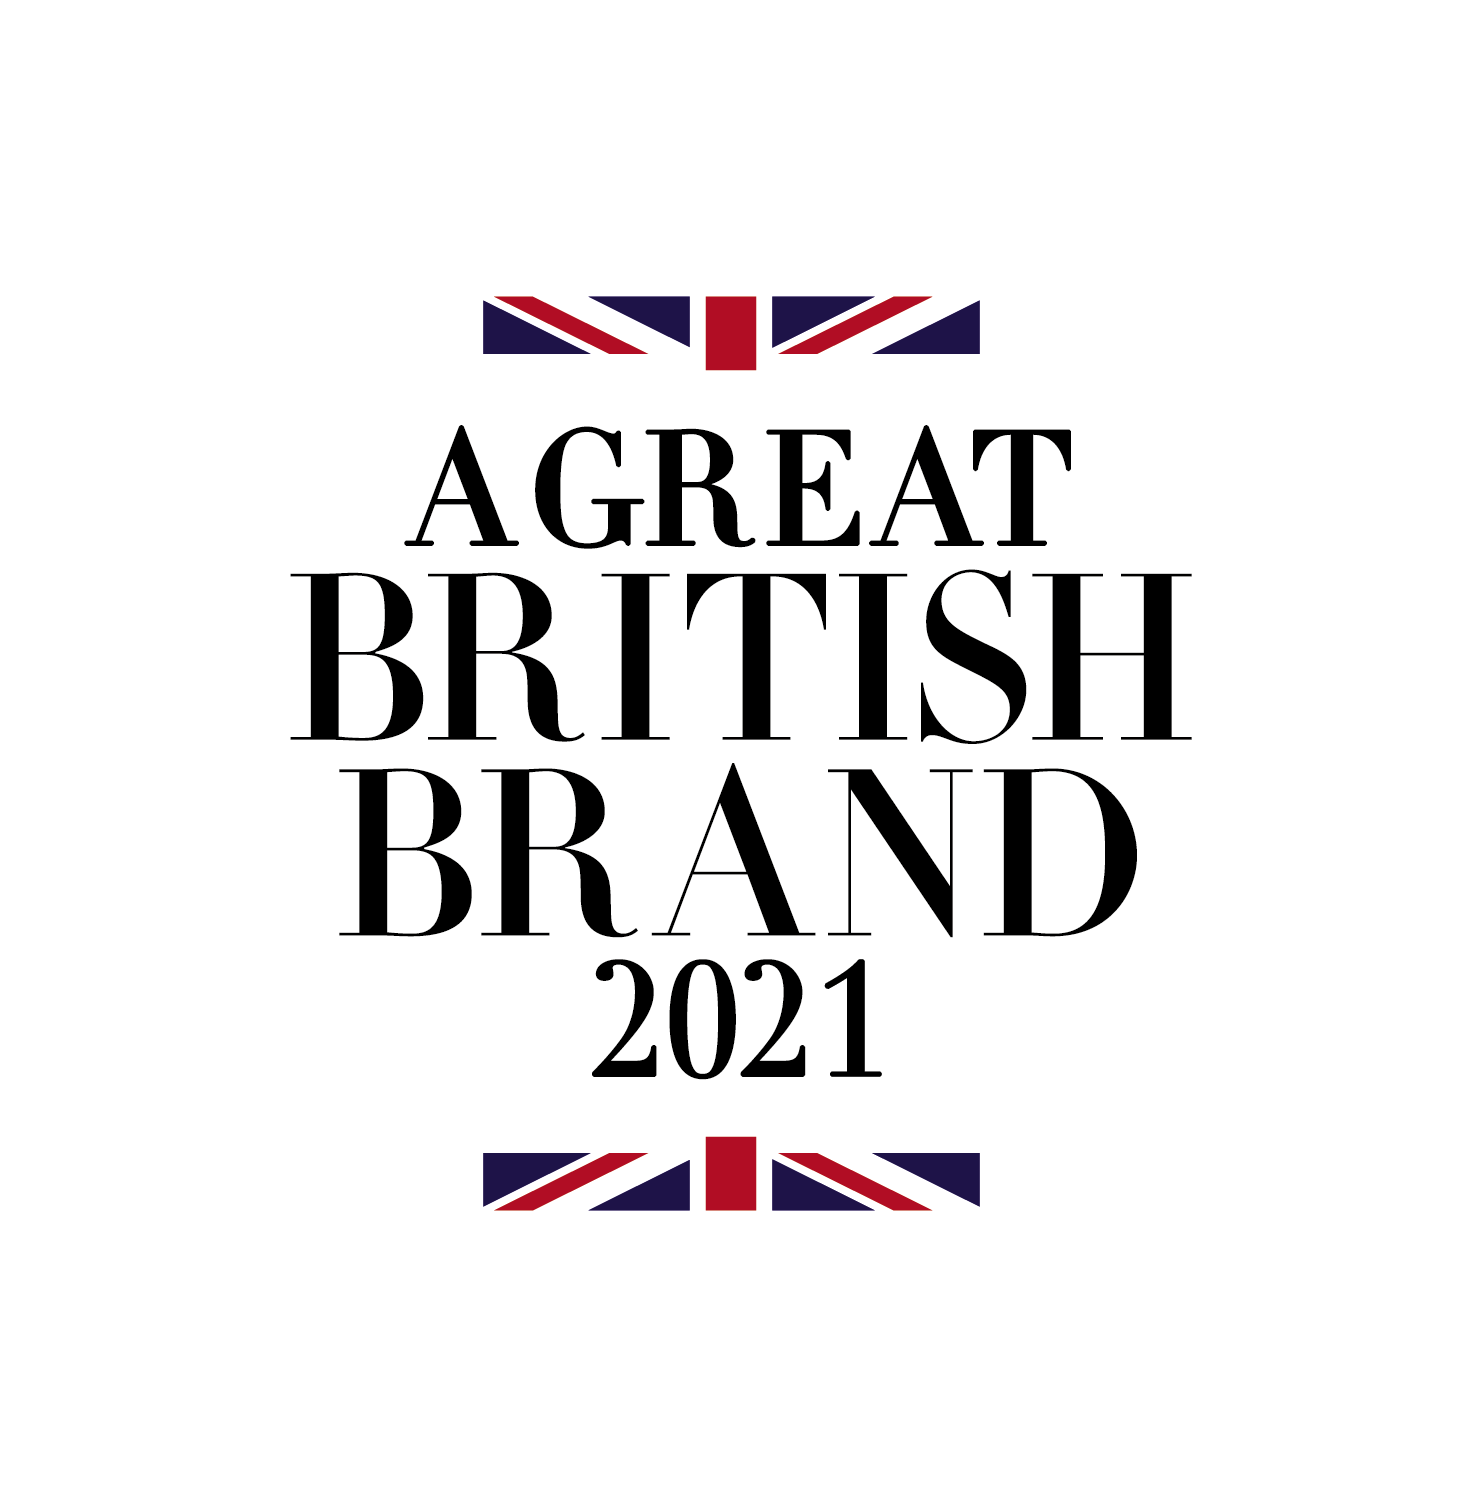 Great British Brands 2021 logo